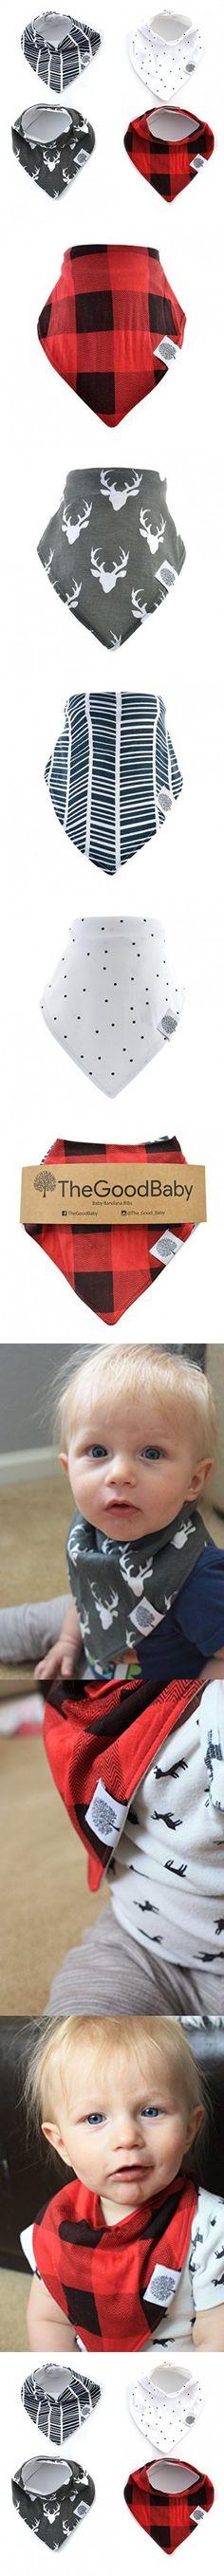 "The Good Baby Bandana Drool Bibs - 4 Pack Baby Bibs for Boys - ""Lumberjack Set"""